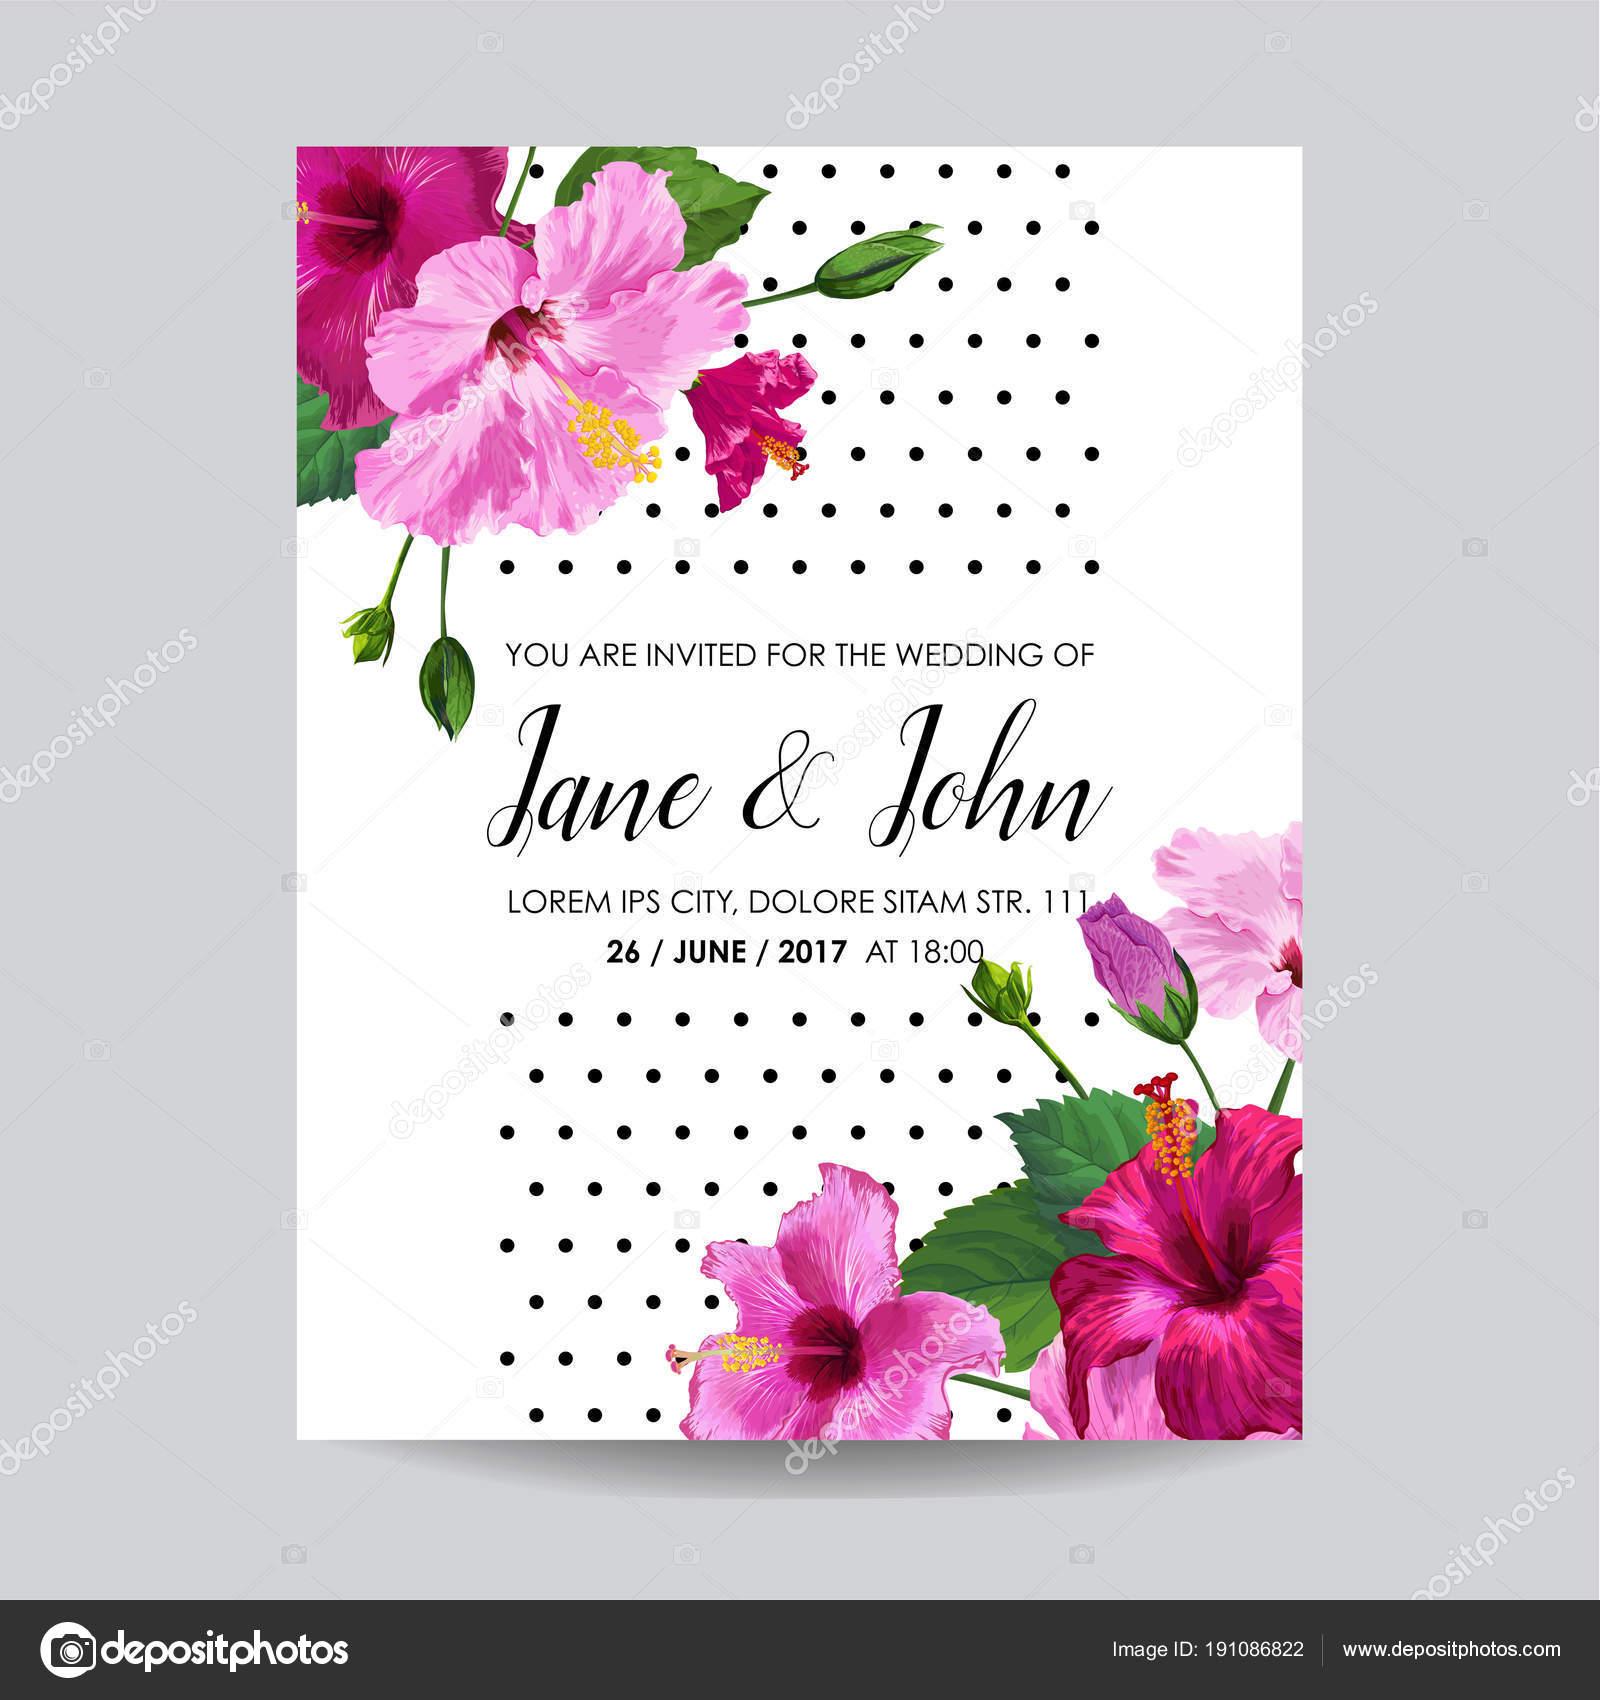 wedding invitations templates purple - Roho.4senses.co